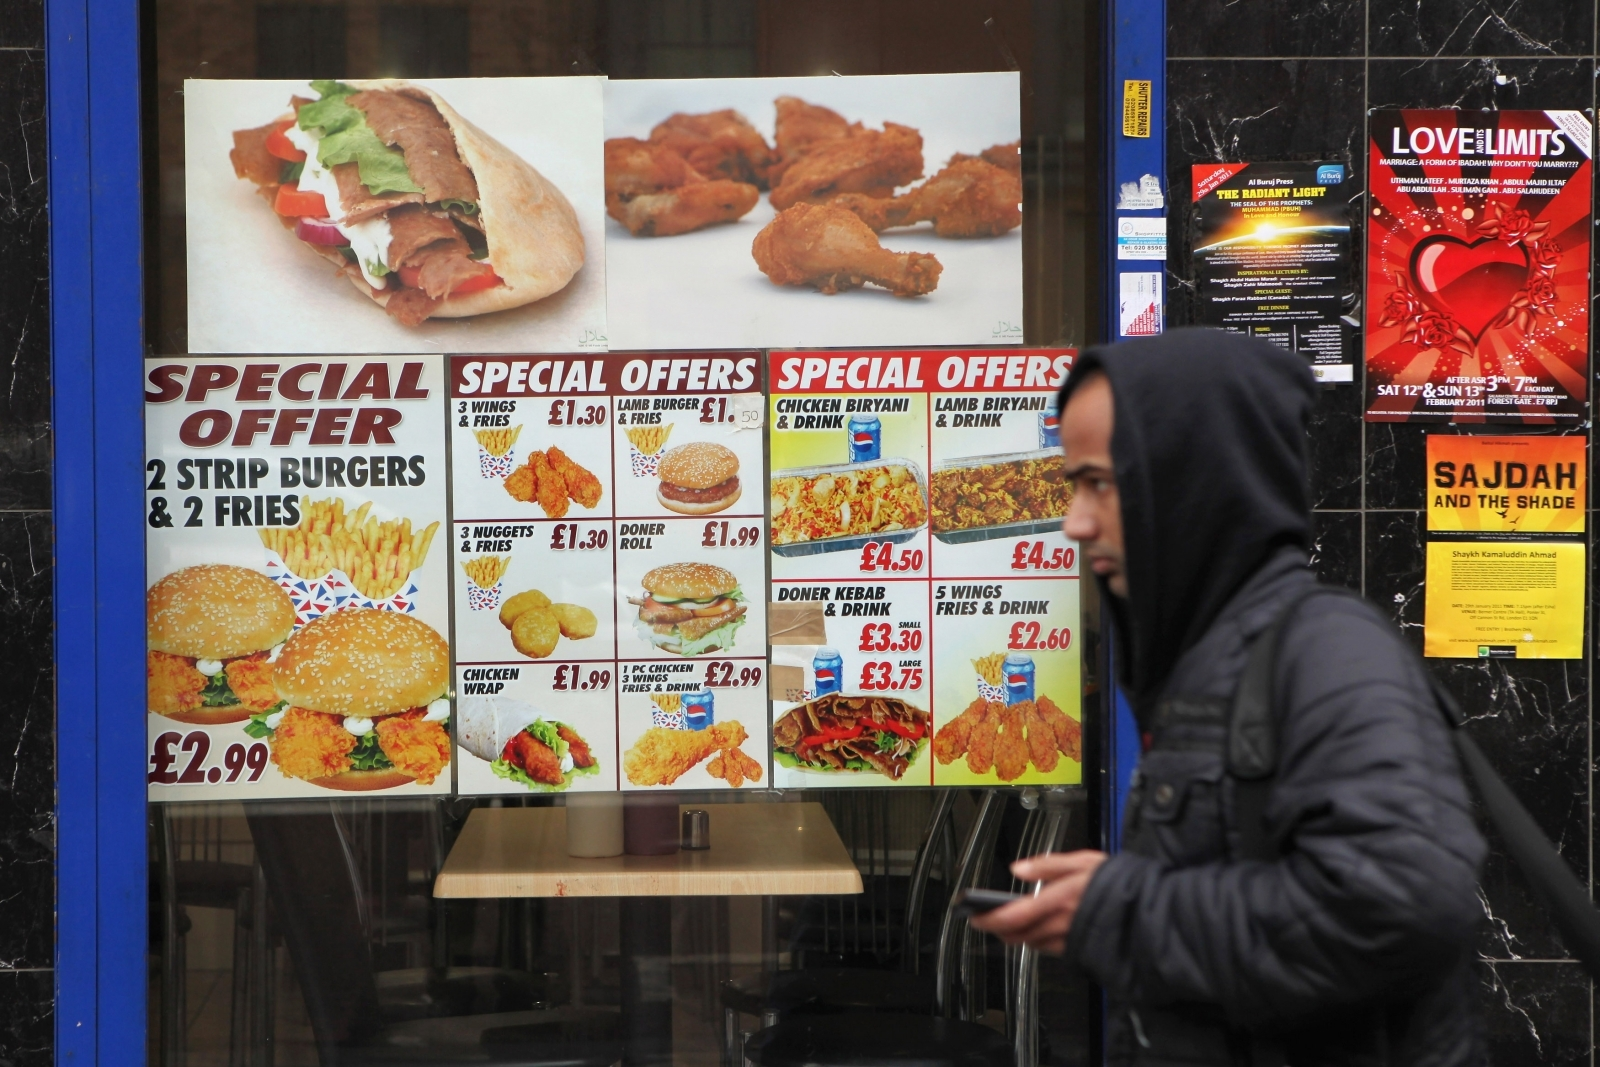 London fast food